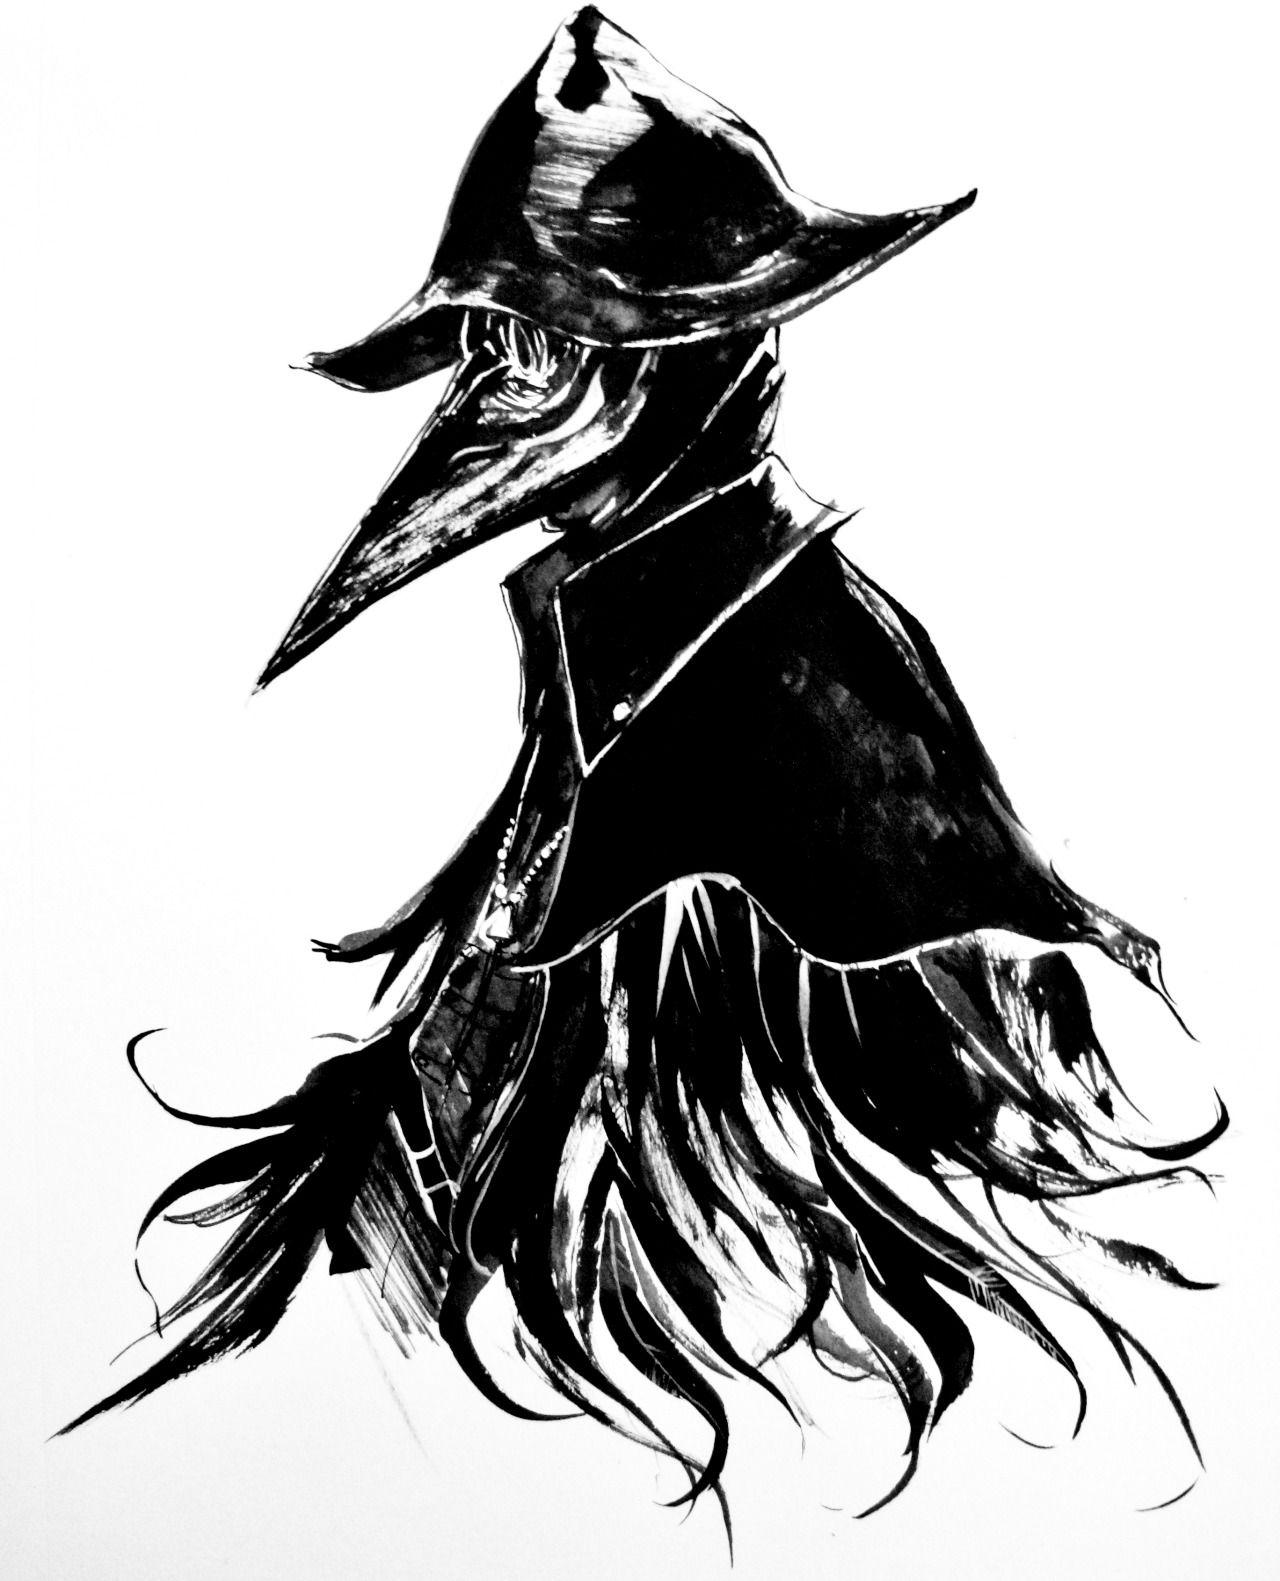 jpg stock Bloodborne drawing eileen the crow. Pin by daniel g